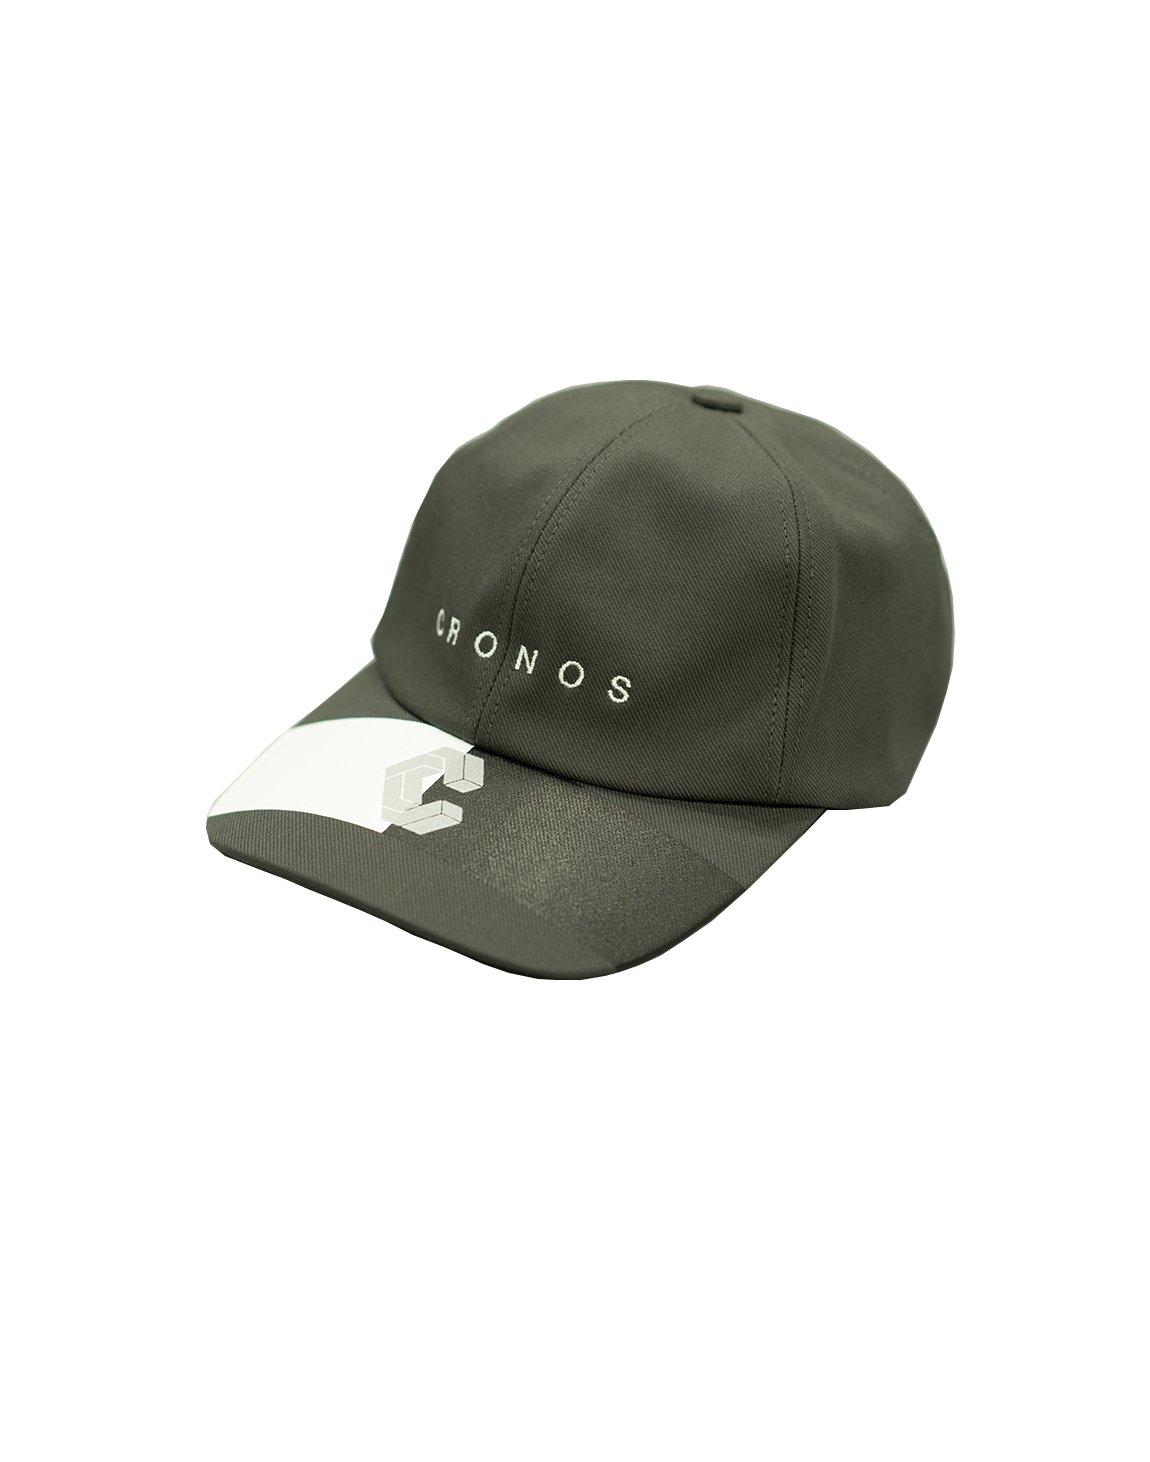 CRONOS HALF COLOR CAP 【KHAKI】